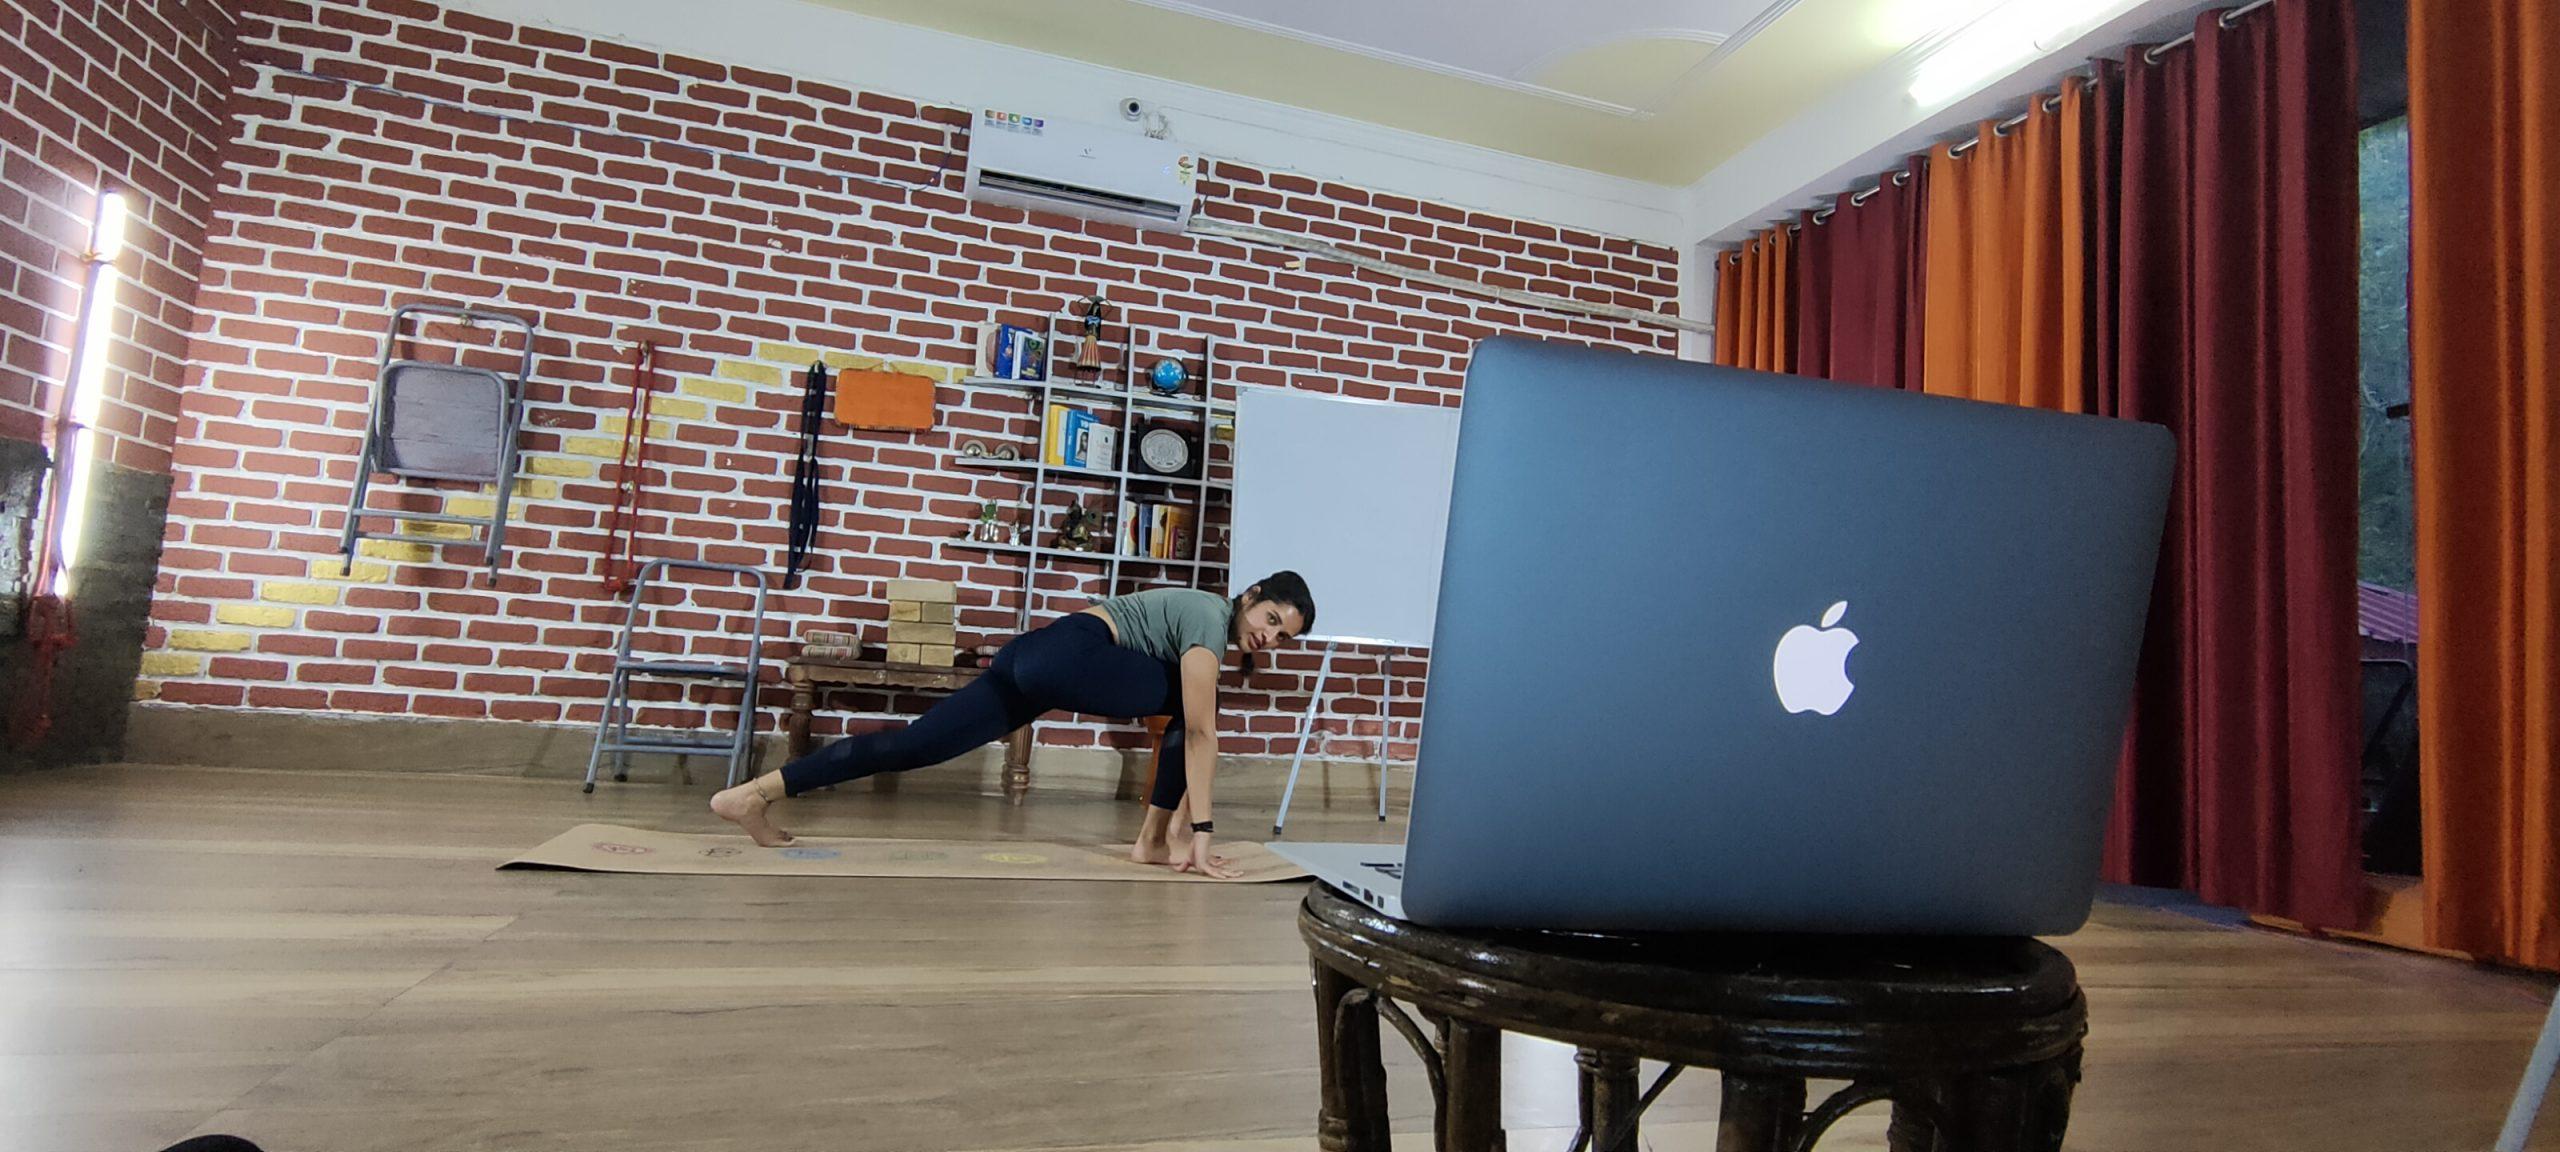 Awaken your practice Yoga Flow photo №3